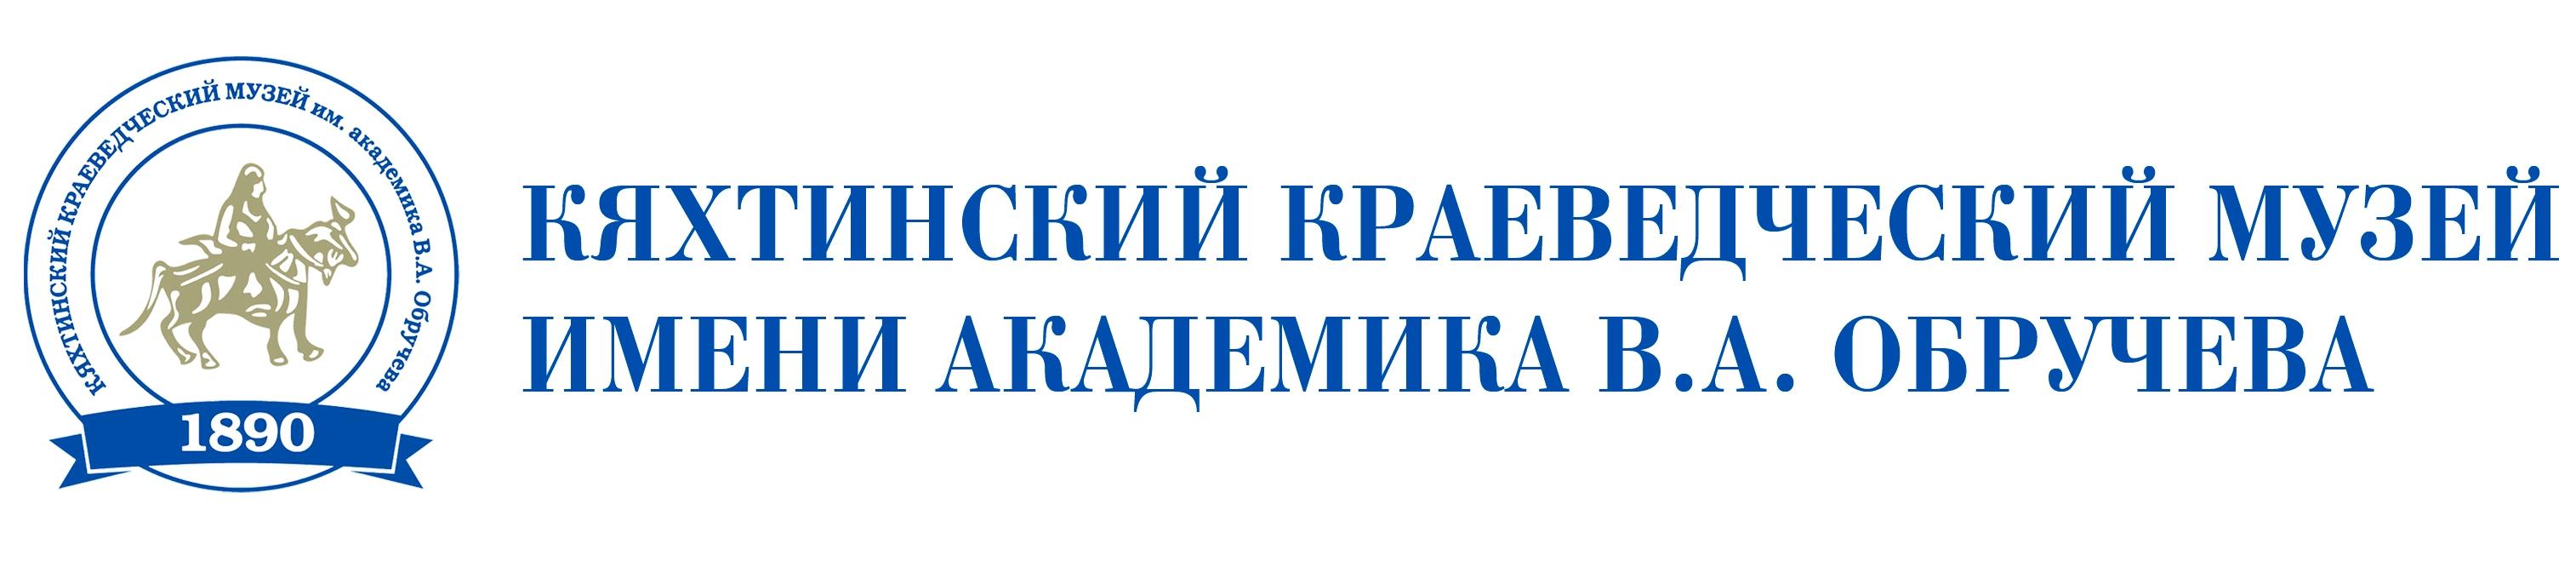 "Кяхтинский краеведческий музей ГАУК РБ ""Кяхтинский краеведческий музей"""